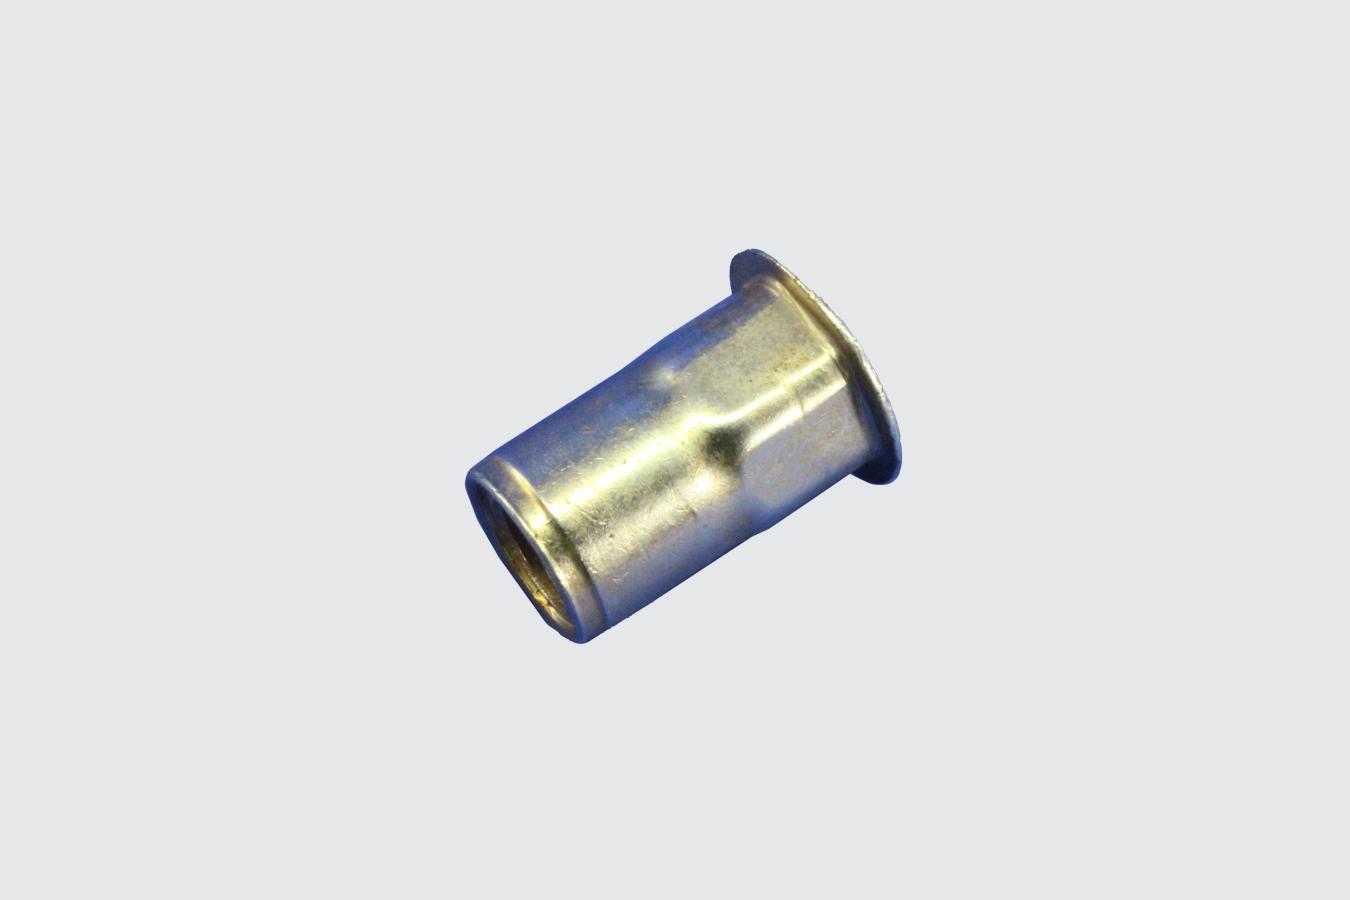 36895746-NUTSERT, M8-1.25 HEX (14GA - 4GA) ZINC